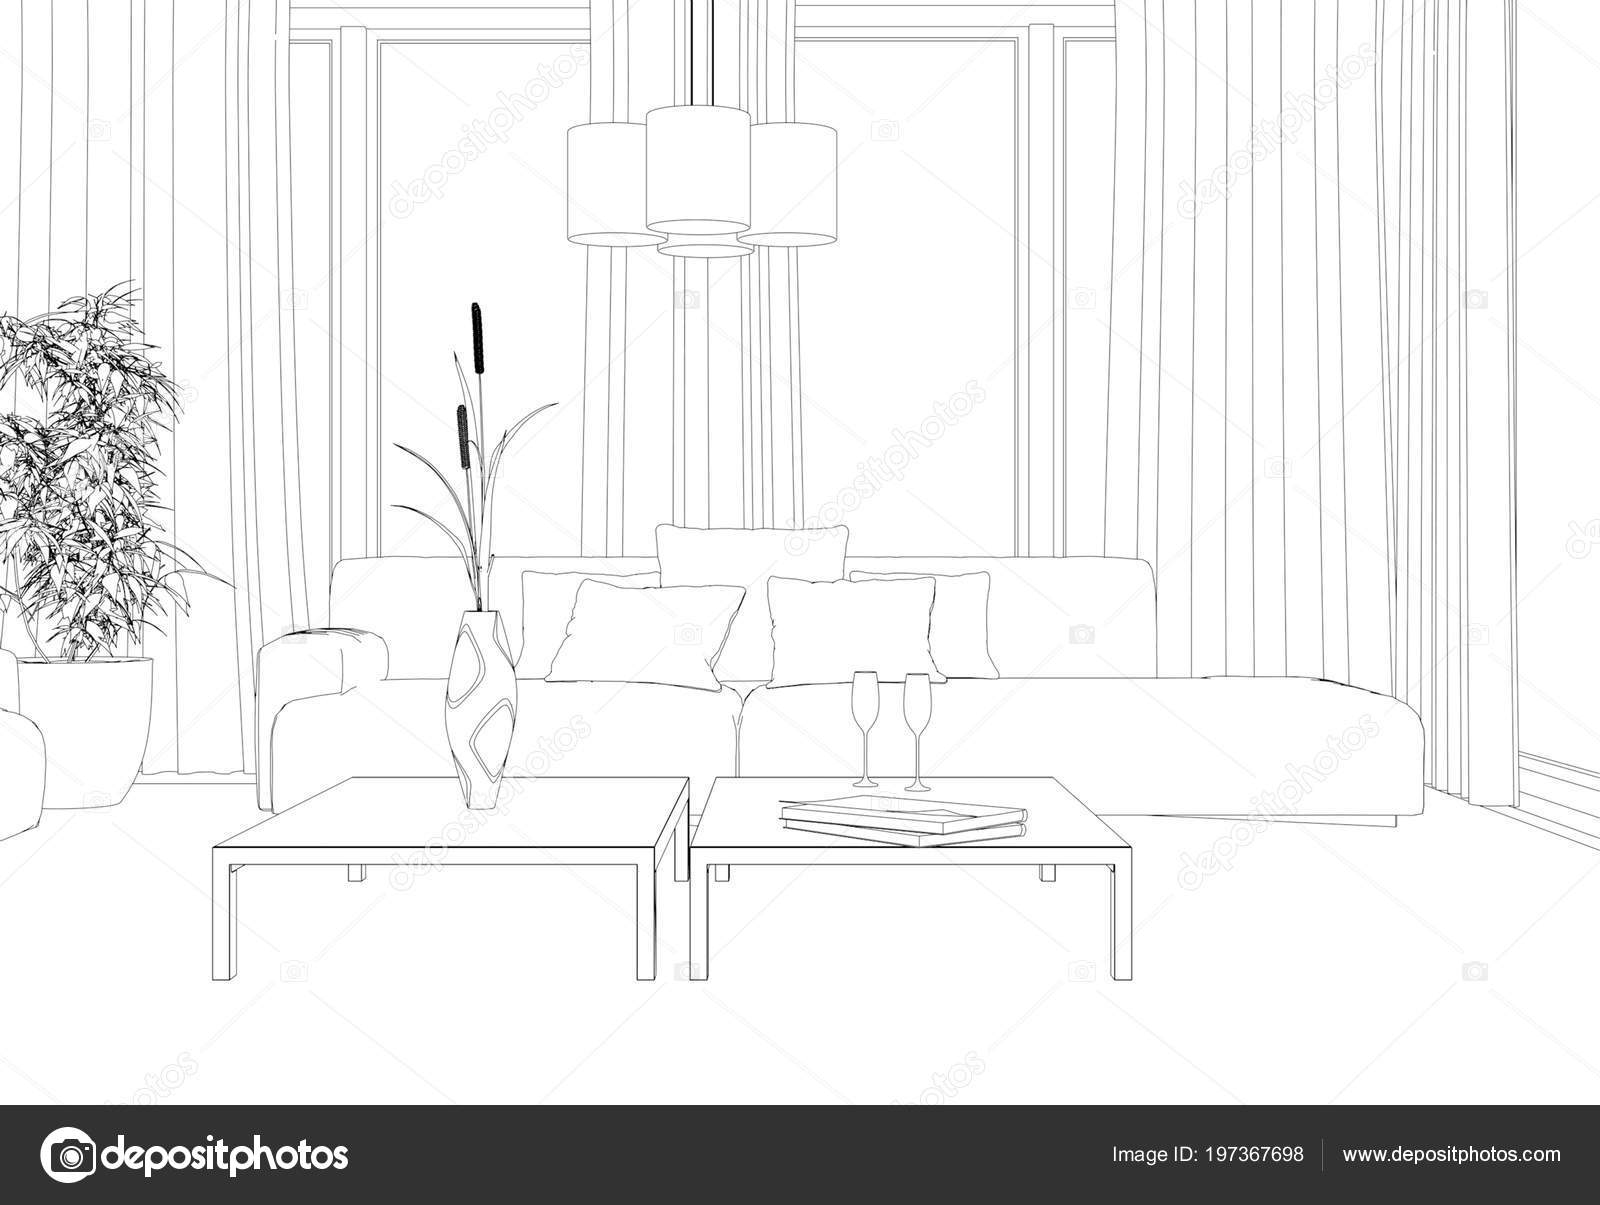 https://st4.depositphotos.com/1019178/19736/i/1600/depositphotos_197367698-stockafbeelding-interieurdesign-woonkamer-aangepaste-tekening.jpg